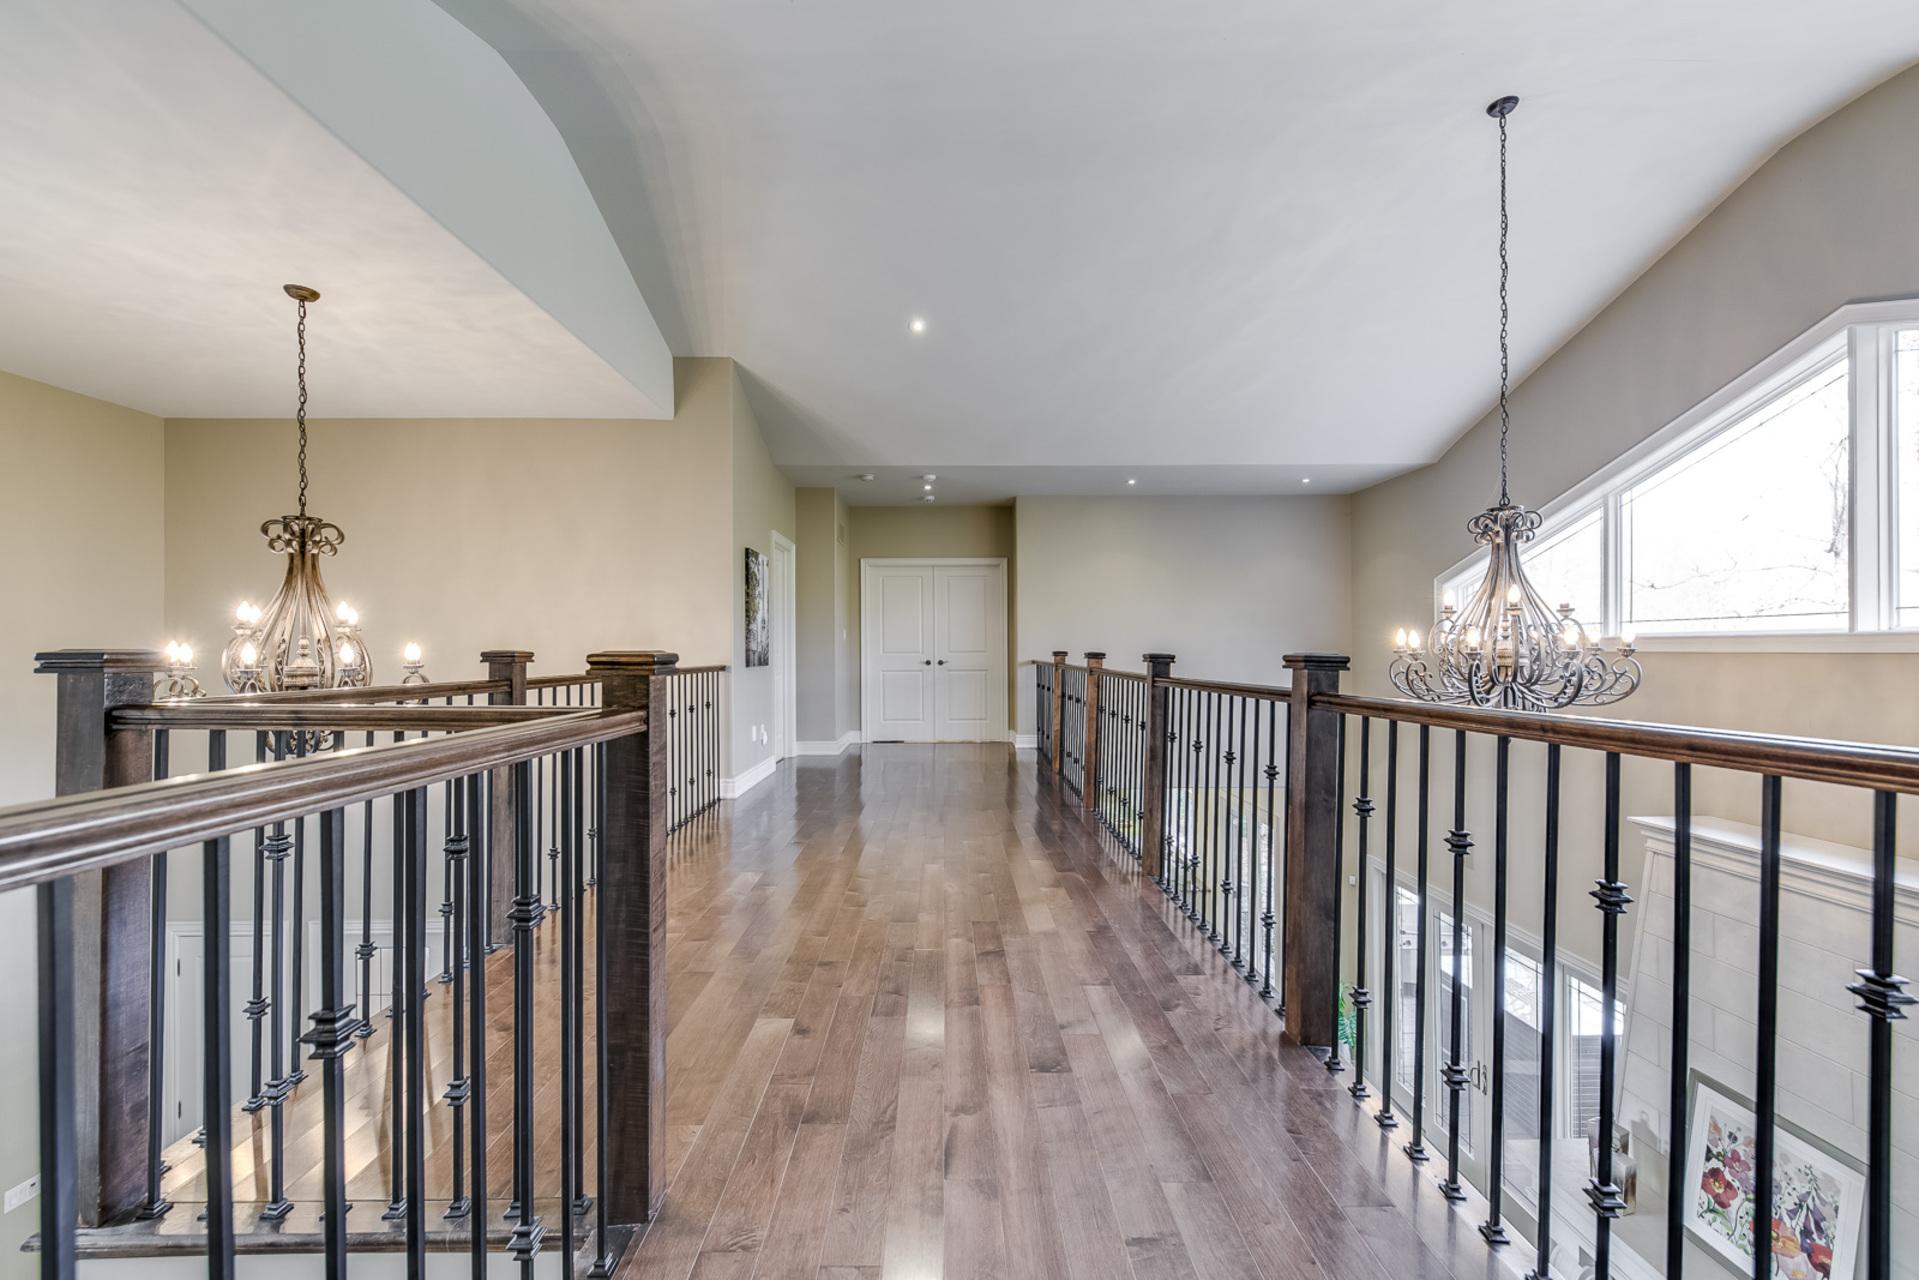 2nd Floor Hallway - 5041 Lakeshore Rd, Burlington - Elite3 & Team at 5041 Lakeshore Road, Appleby, Burlington